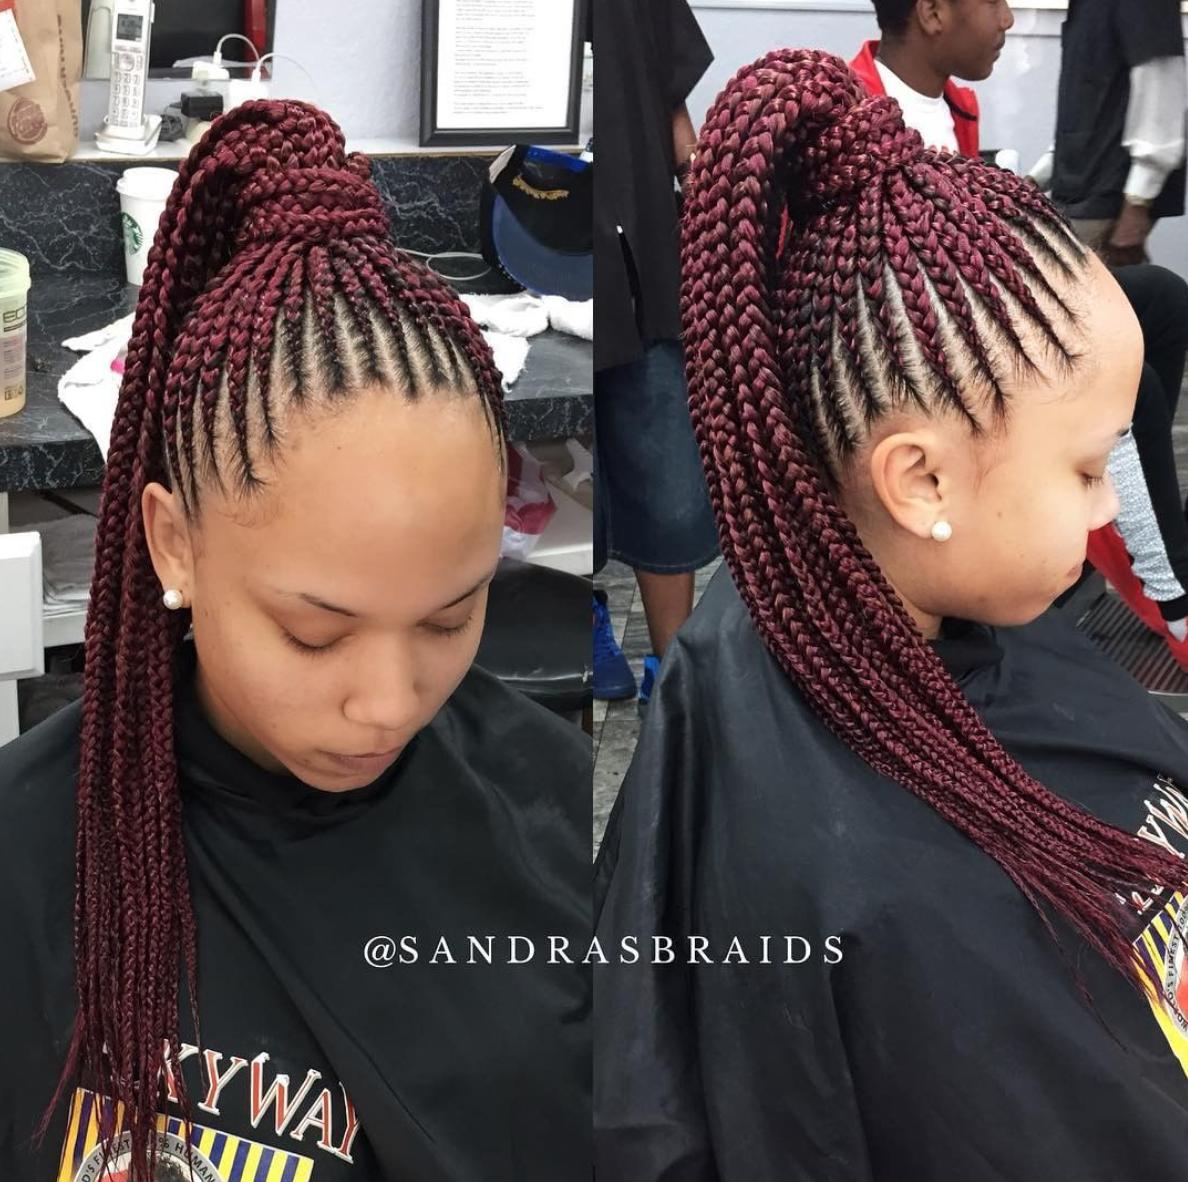 Nice braids by @sandrasbraids - https ...